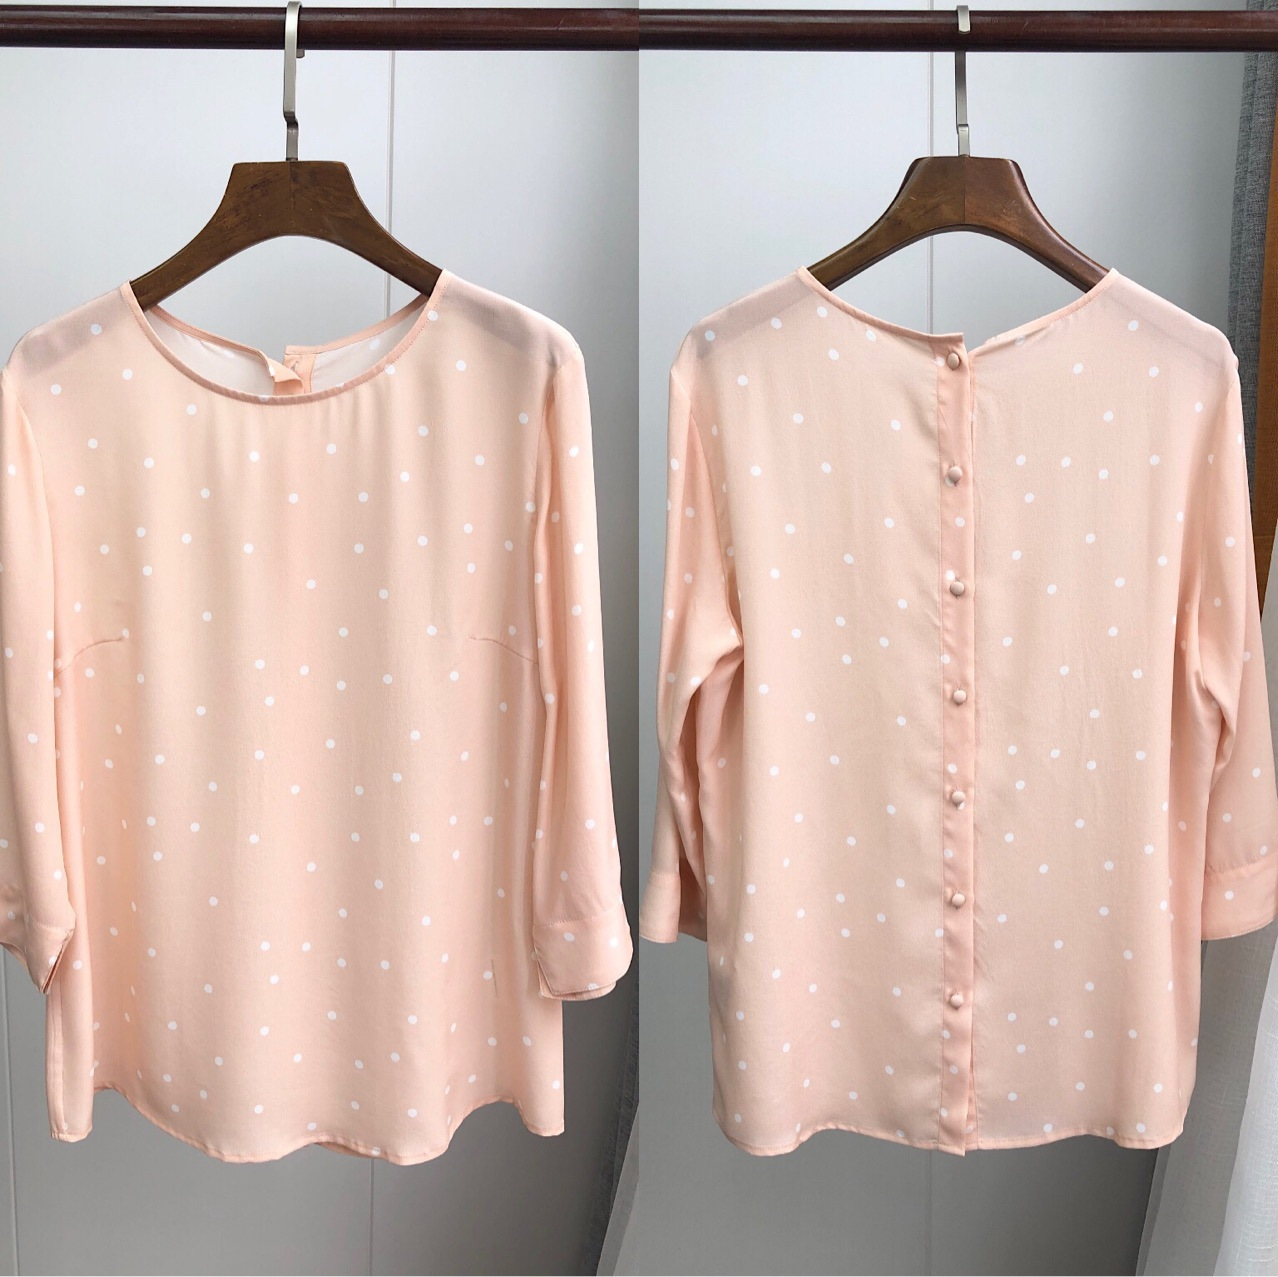 Women Shirt Polka Dot Round Neck Silk Top 2019 Early Summer Gentle Light Powder Back Small